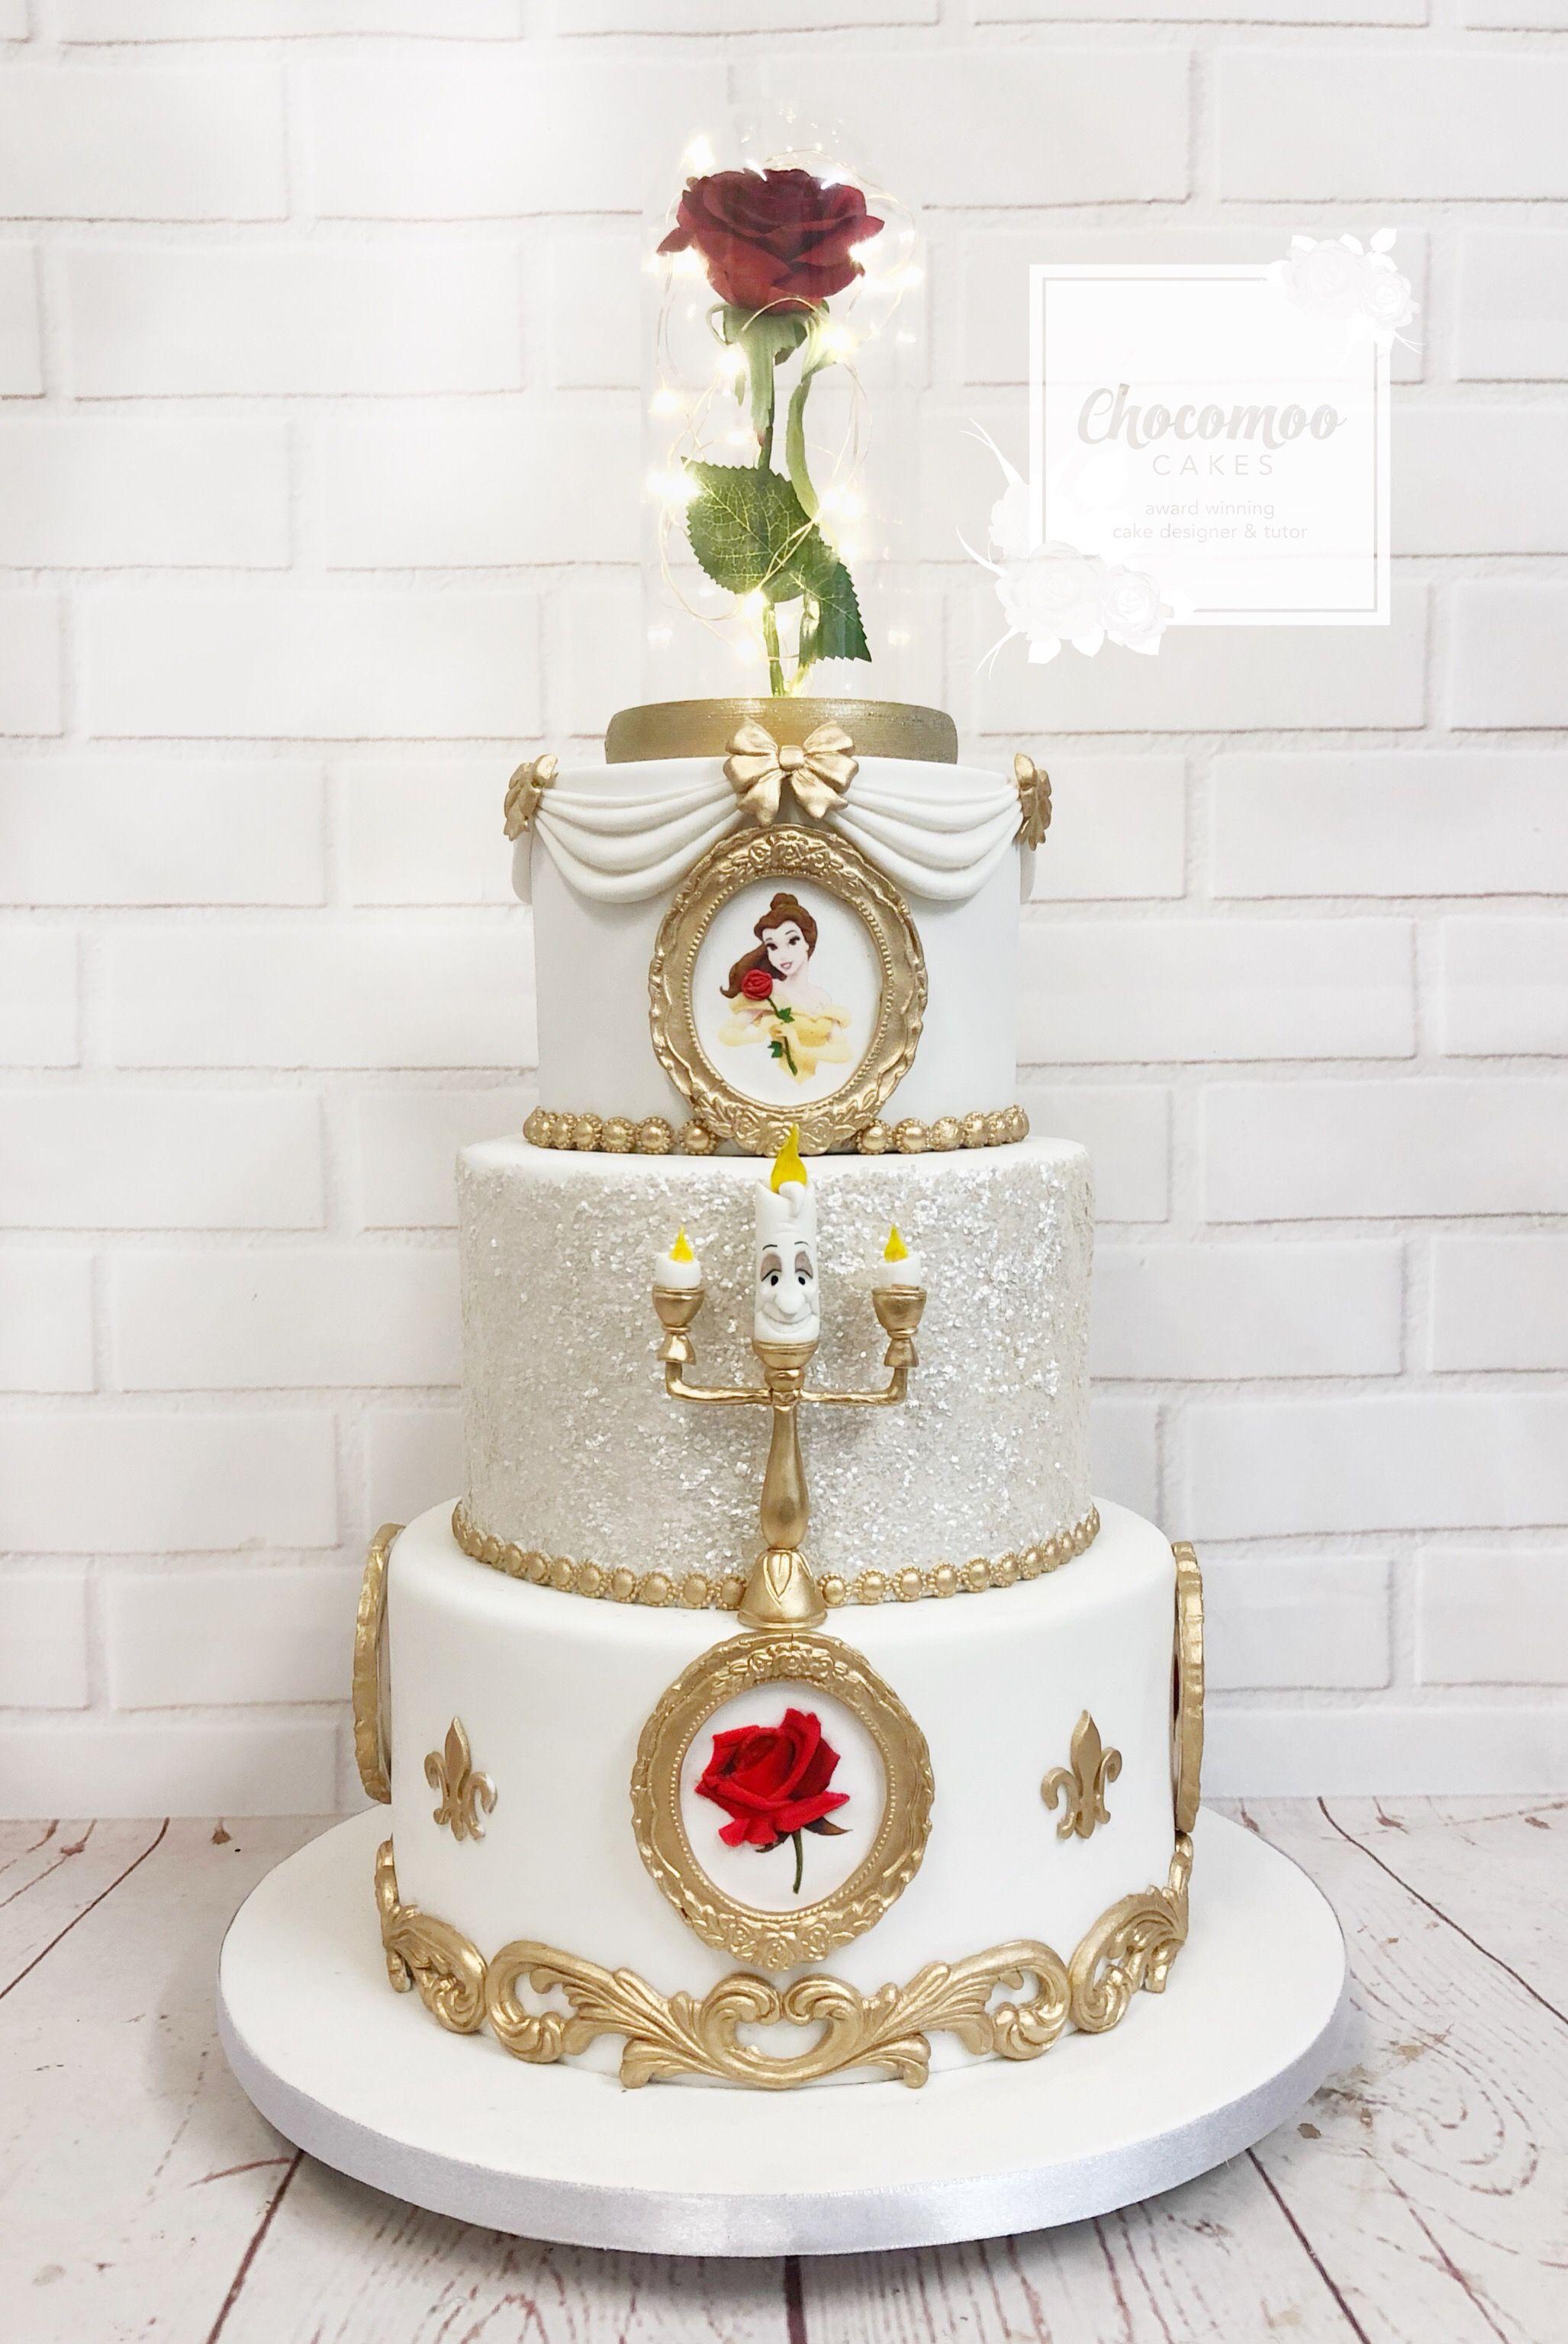 Beauty And The Beast Wedding Cake.Beauty And The Beast Wedding Cake My Wedding 2018 In 2019 Beauty